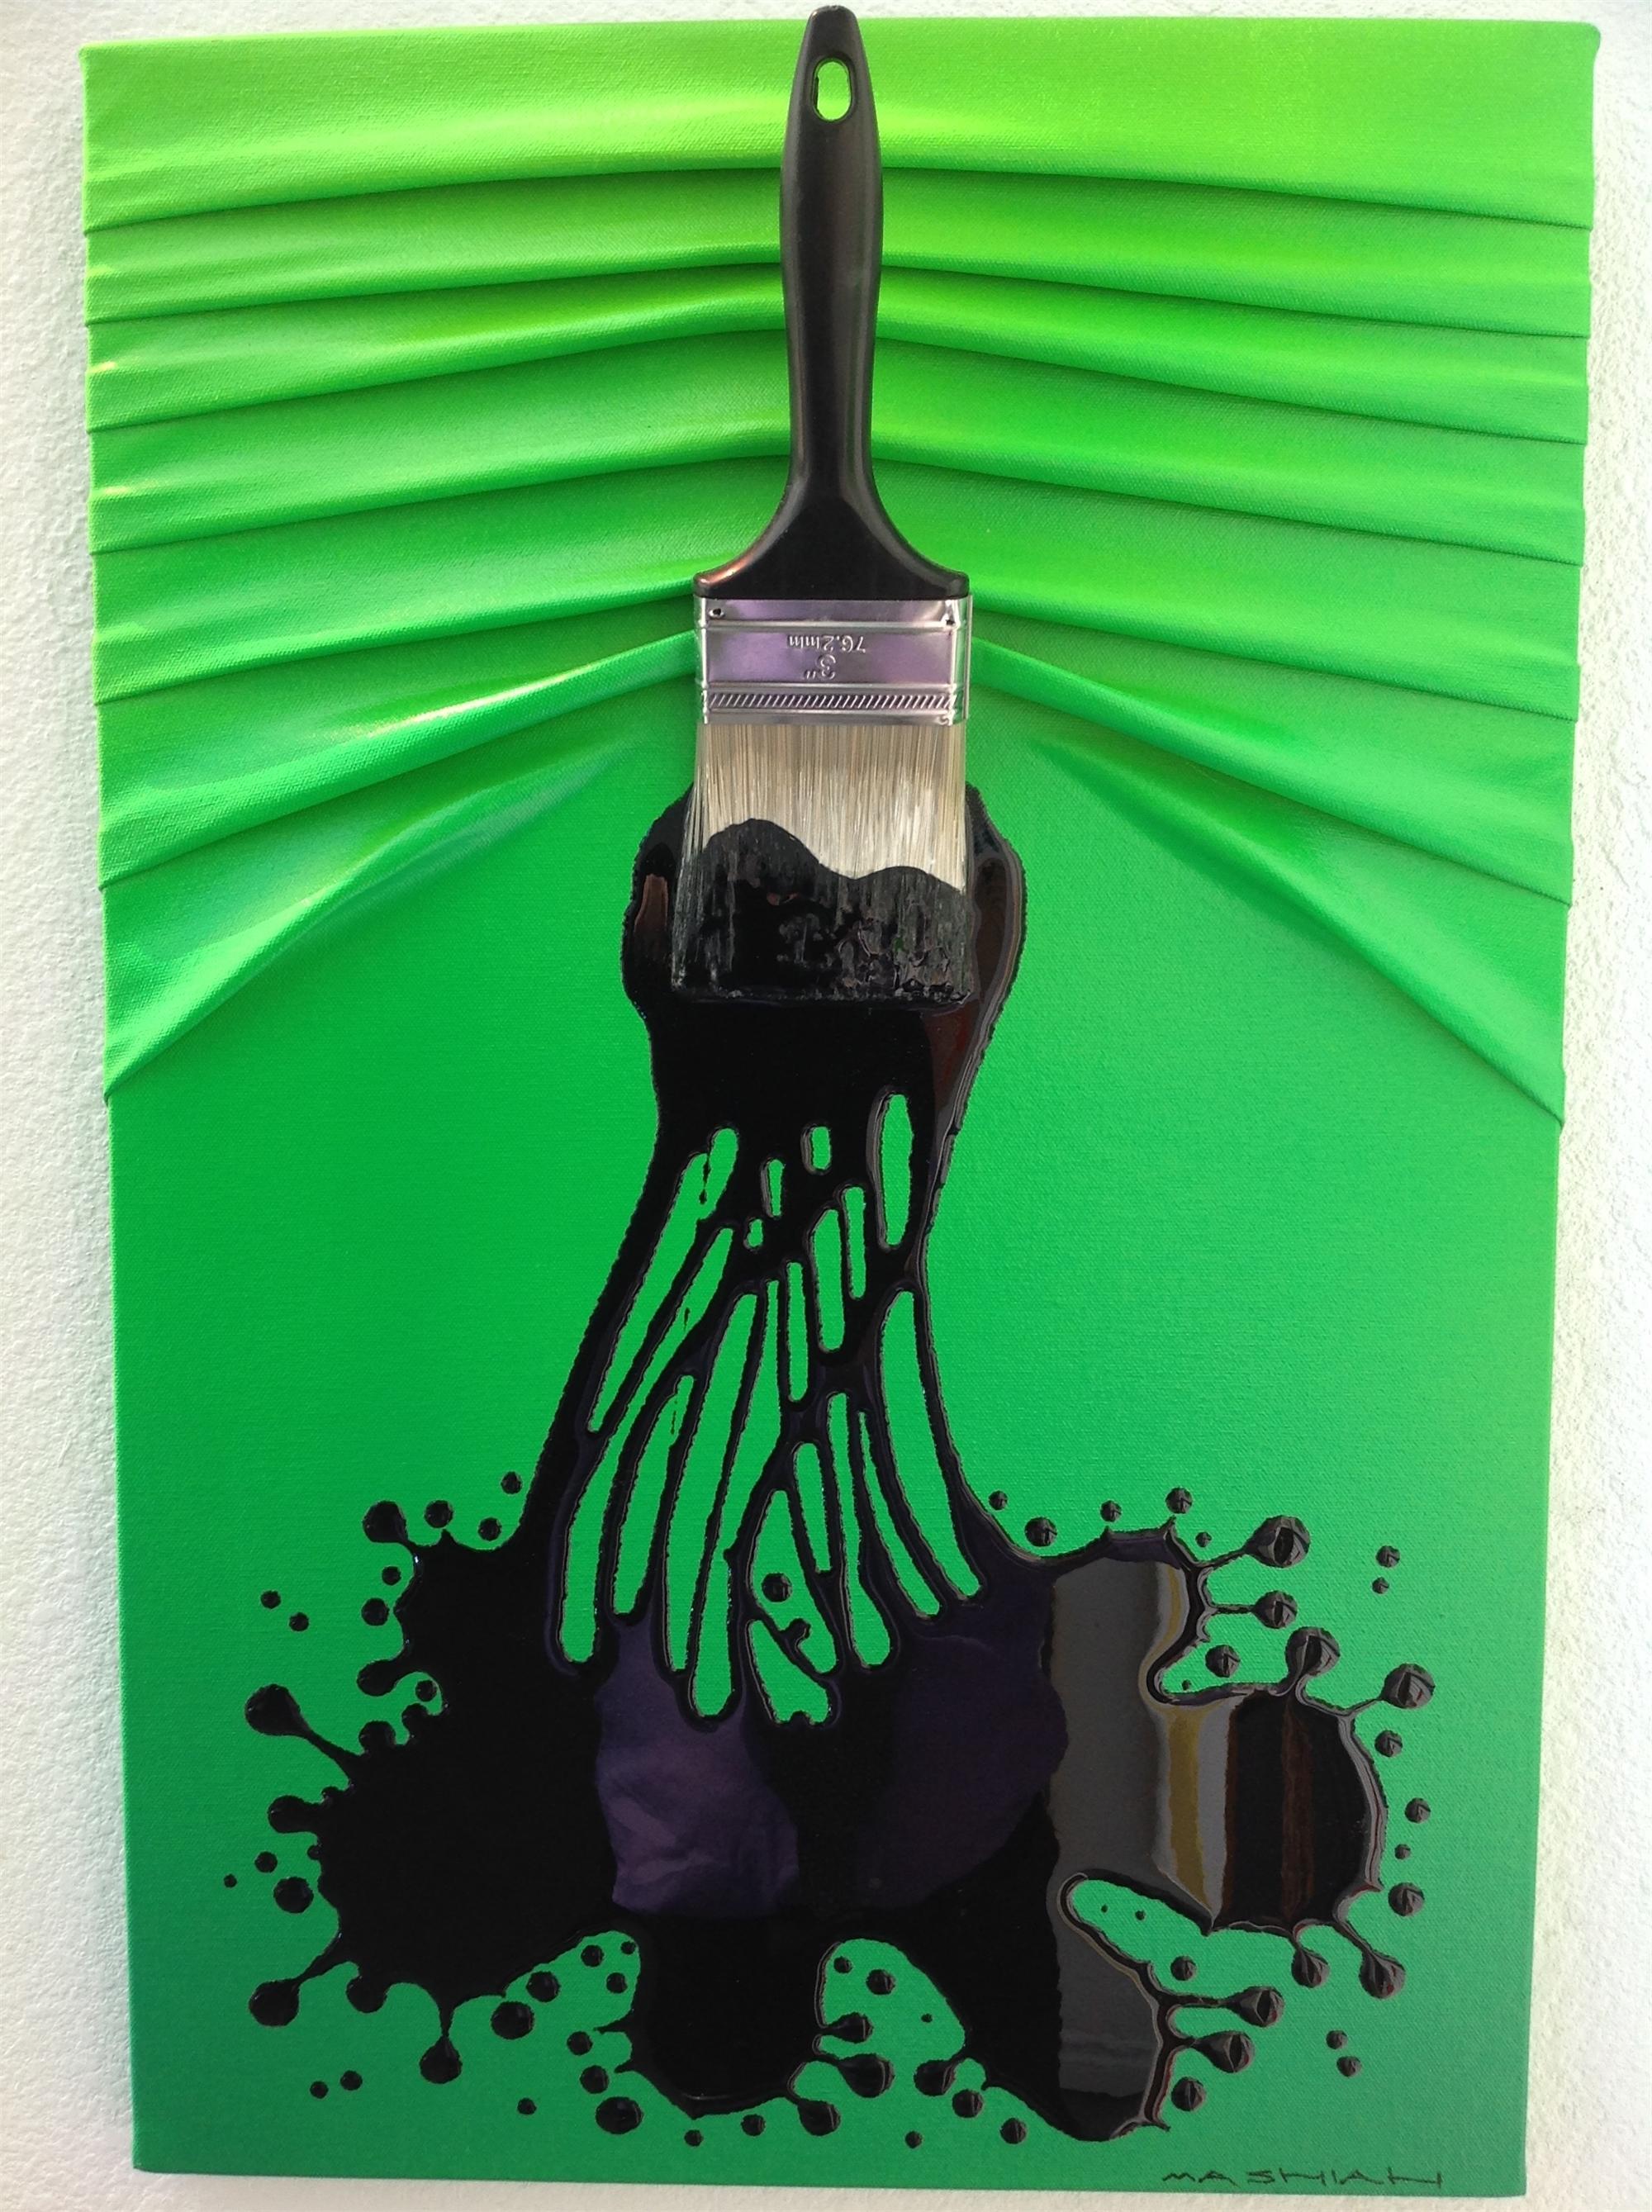 """Lets Paint"" Small Black on Dk. Green/lt.green Ombre by Efi Mashiah"